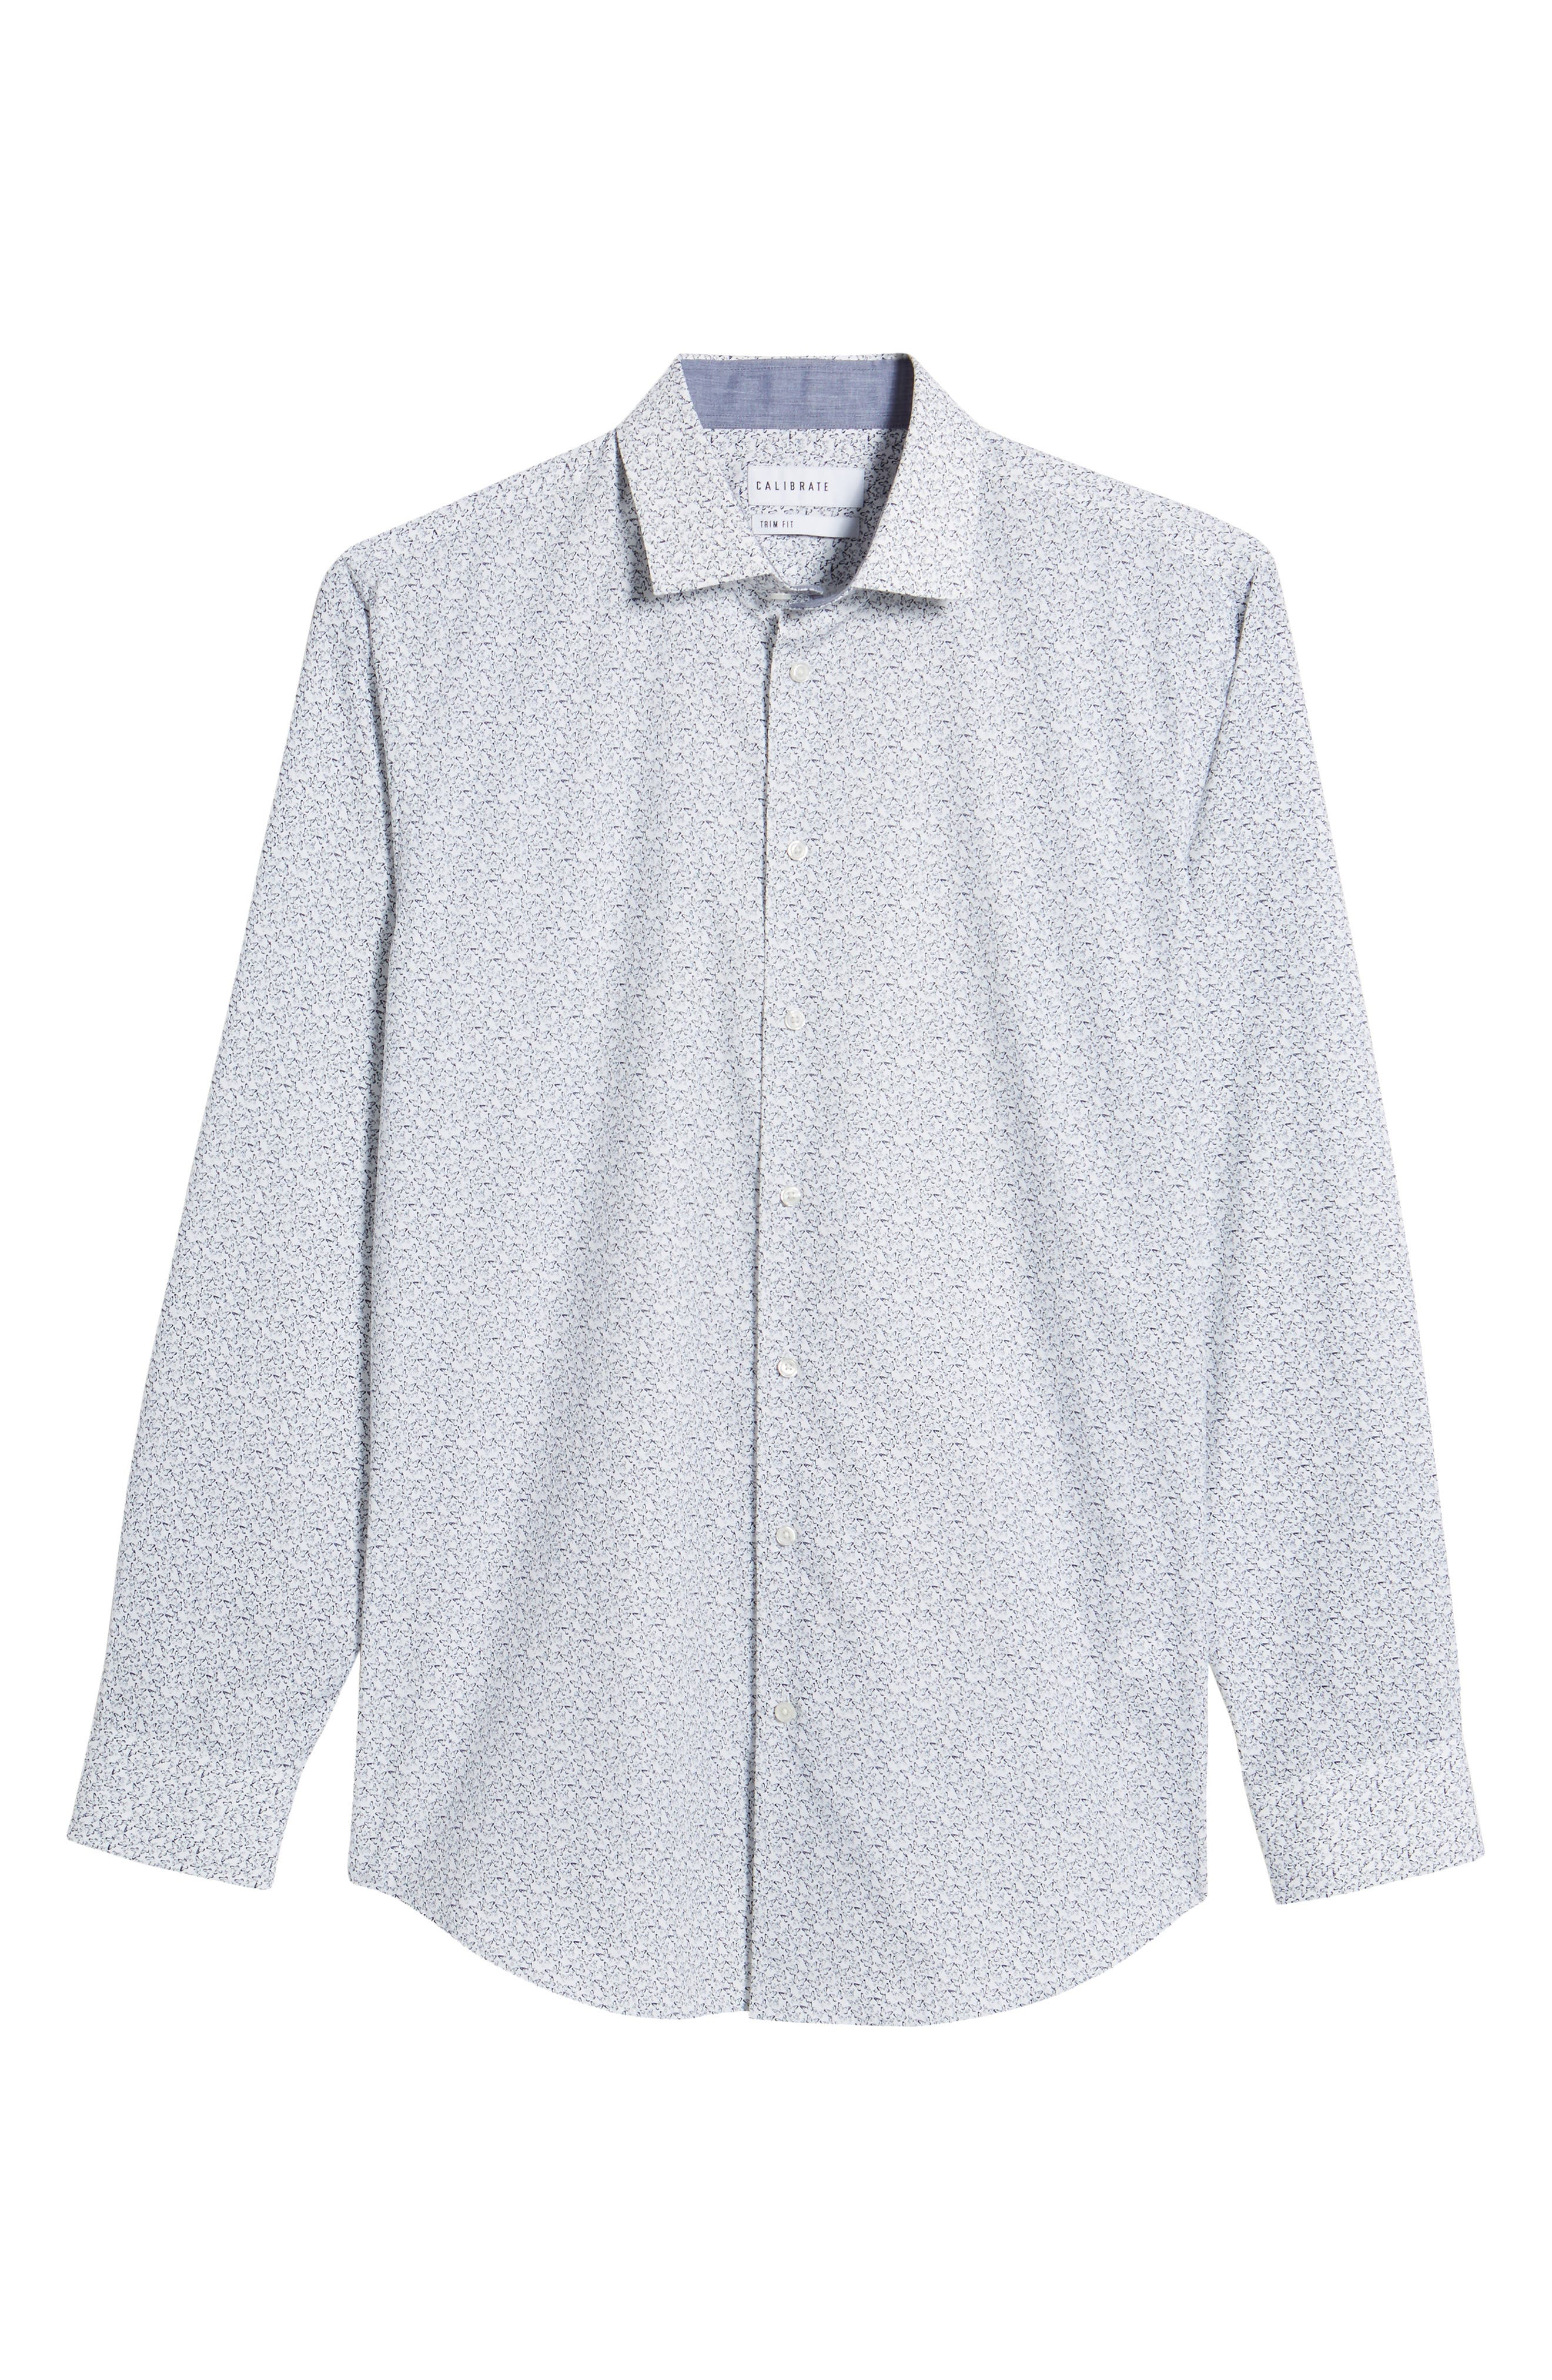 Trim Fit Butterfly Print Sport Shirt,                             Alternate thumbnail 6, color,                             White